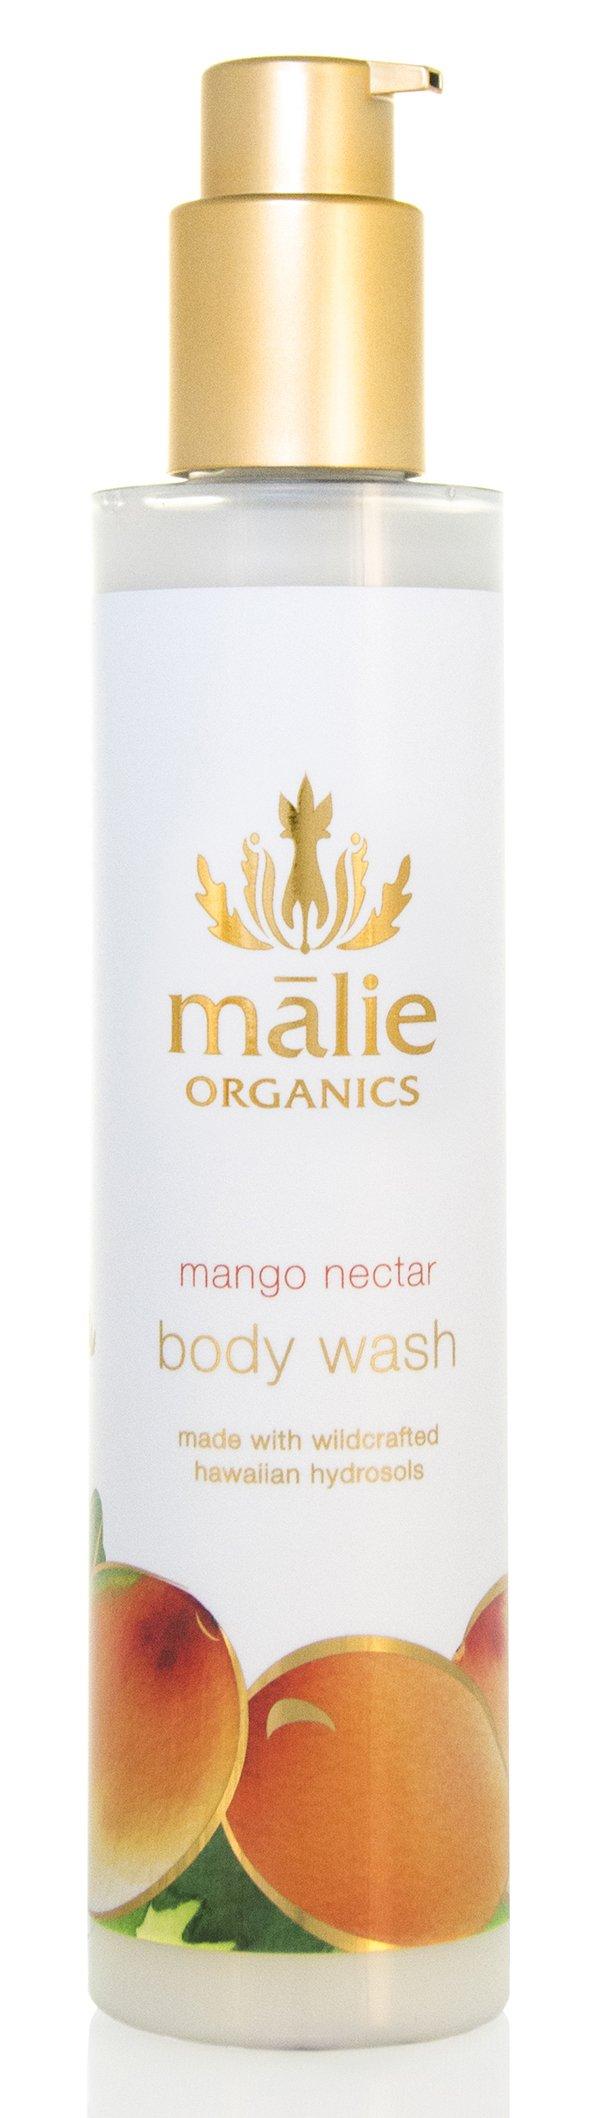 Malie Organics Body Wash - Mango Nectar